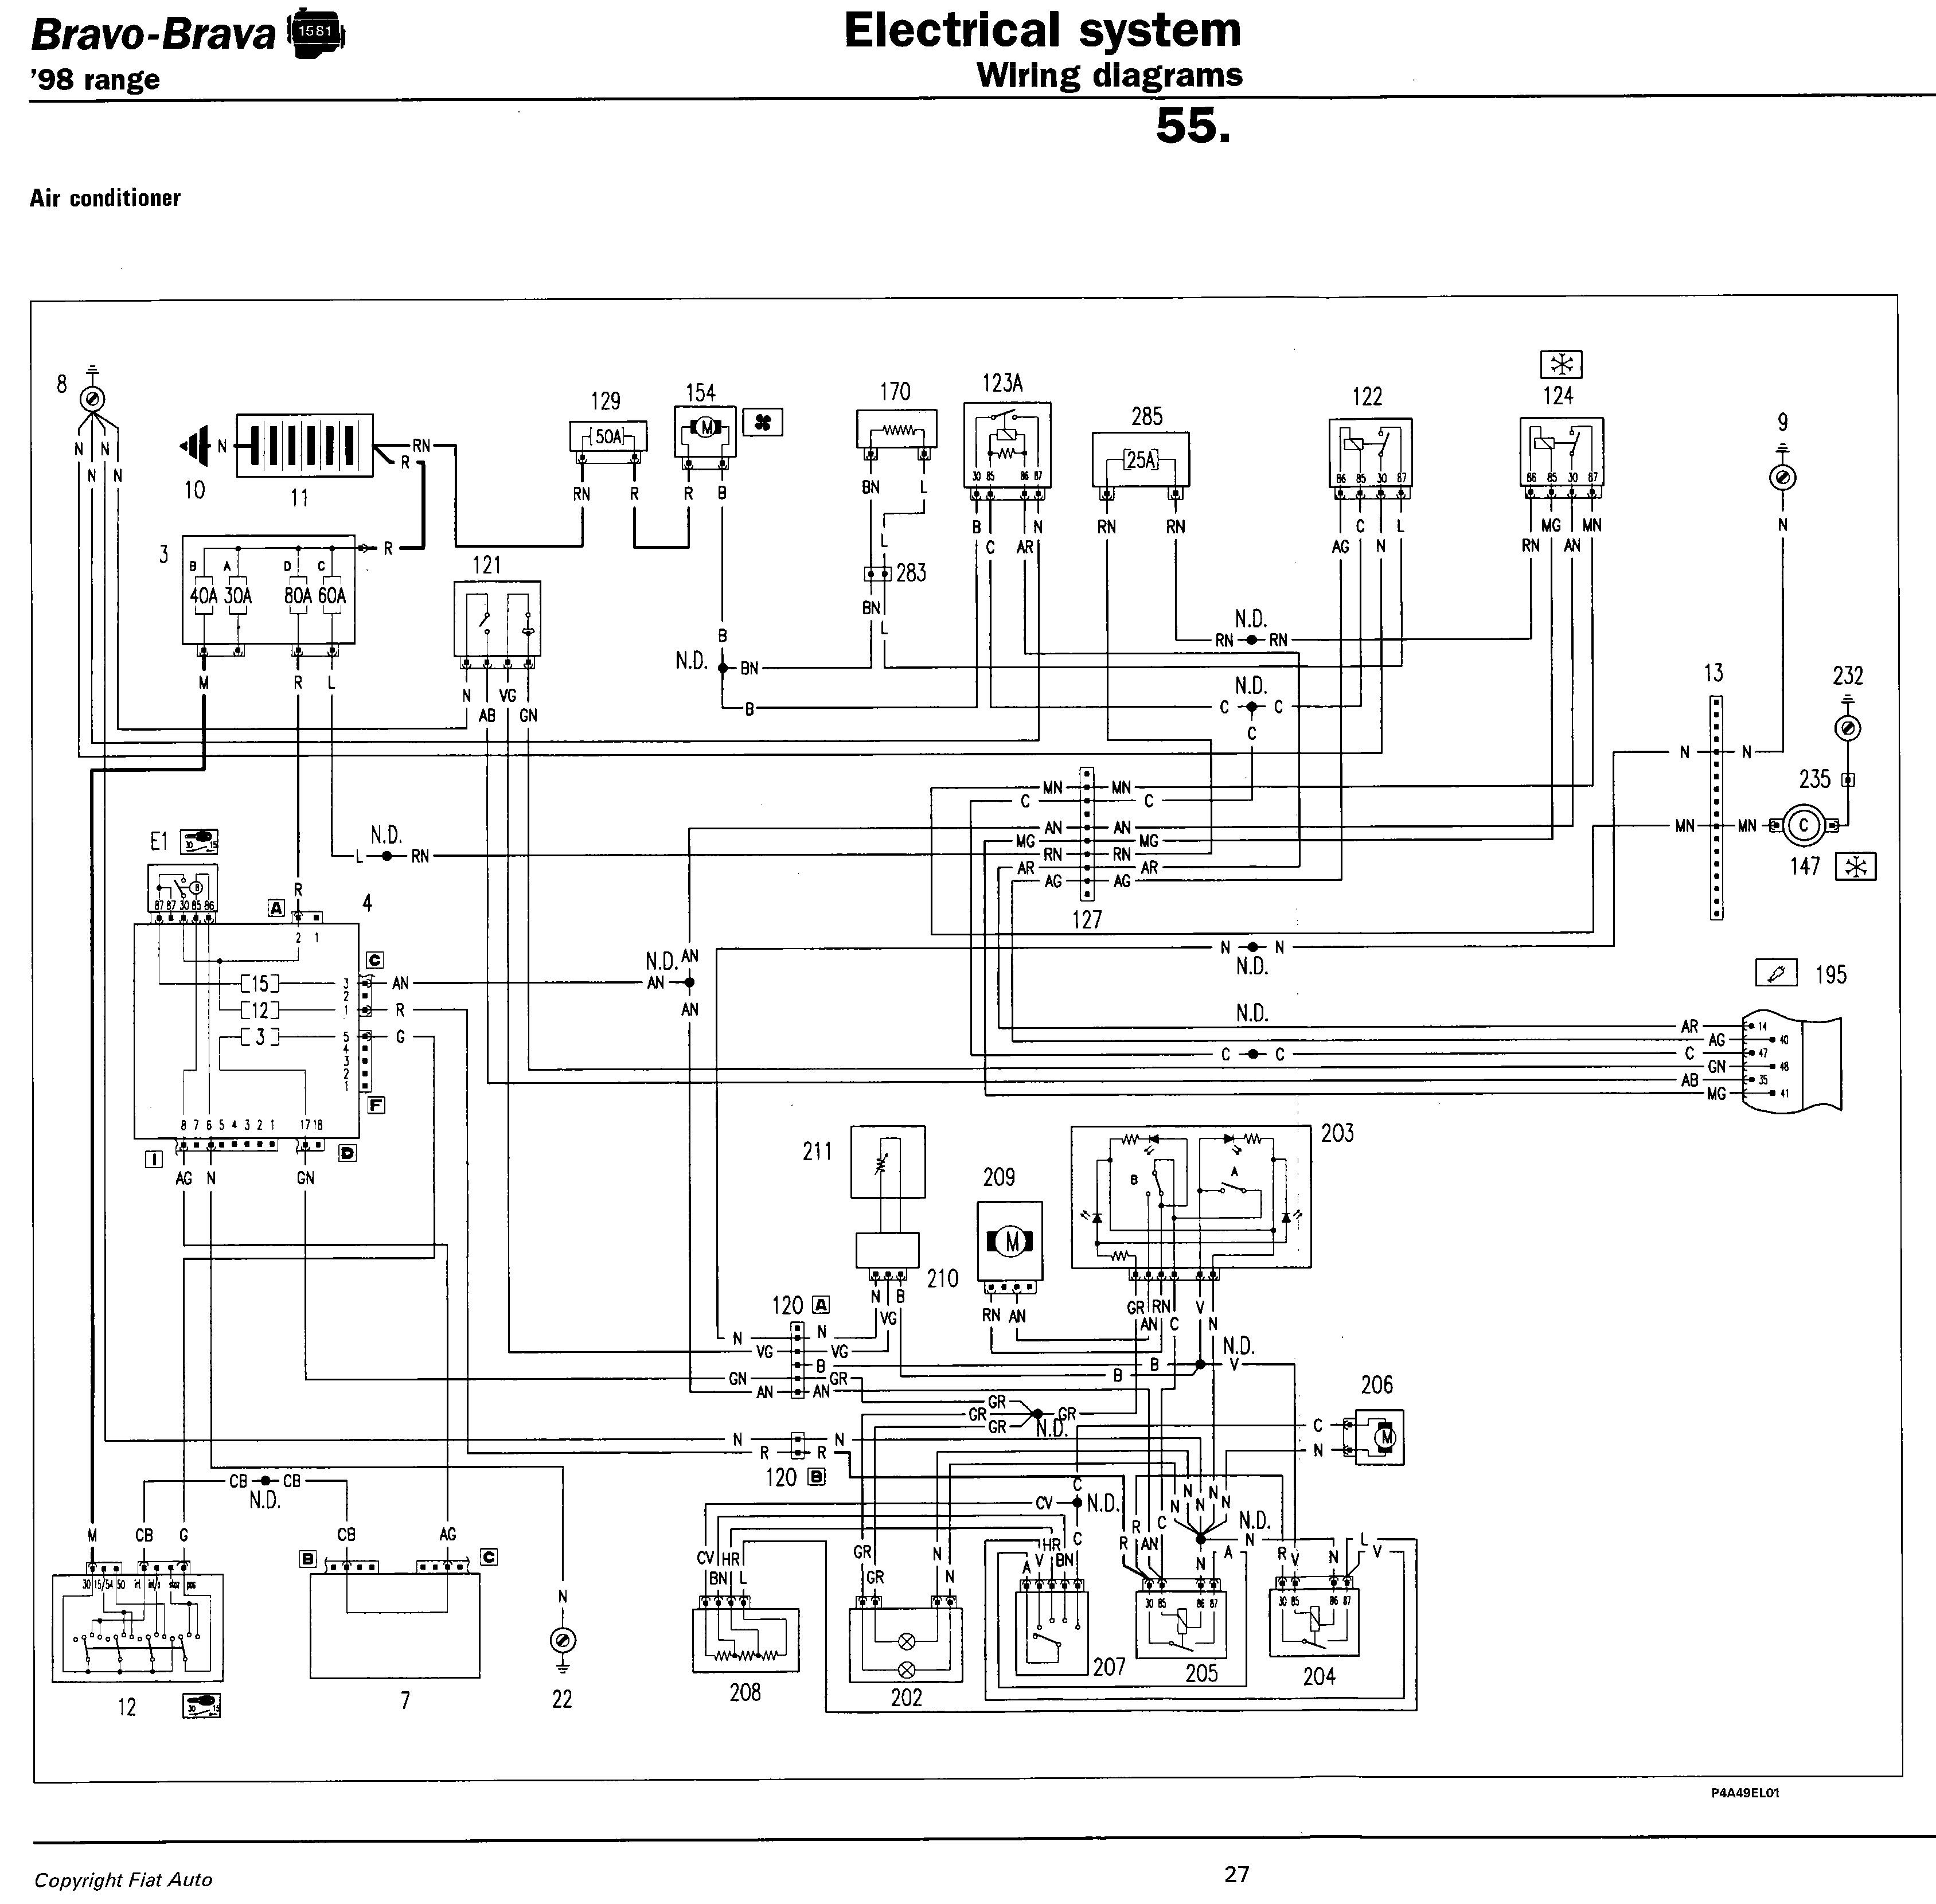 1989 sea doo wiring diagram wiring schematics diagram rh enr green com 92 Bombardier Seadoo 1993 GTS Wiring-Diagram